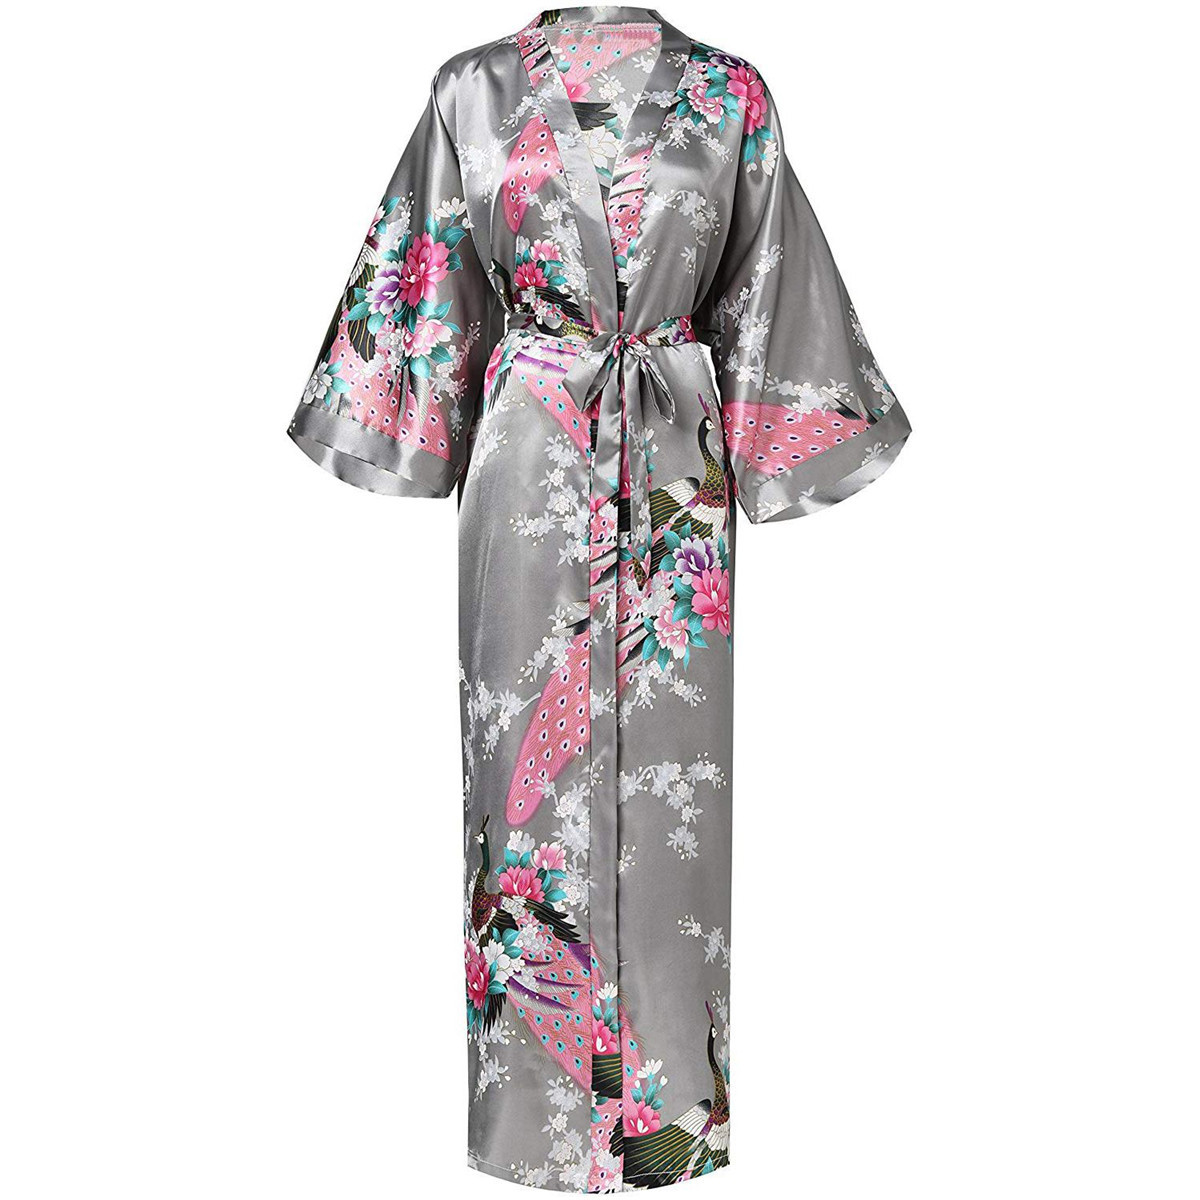 Exquisite Print Flower Women  Robe Kimono Gown Elegant Gray Long Bathrobe Gown Satin Soft Material Bride Wedding Robe Sleepwear